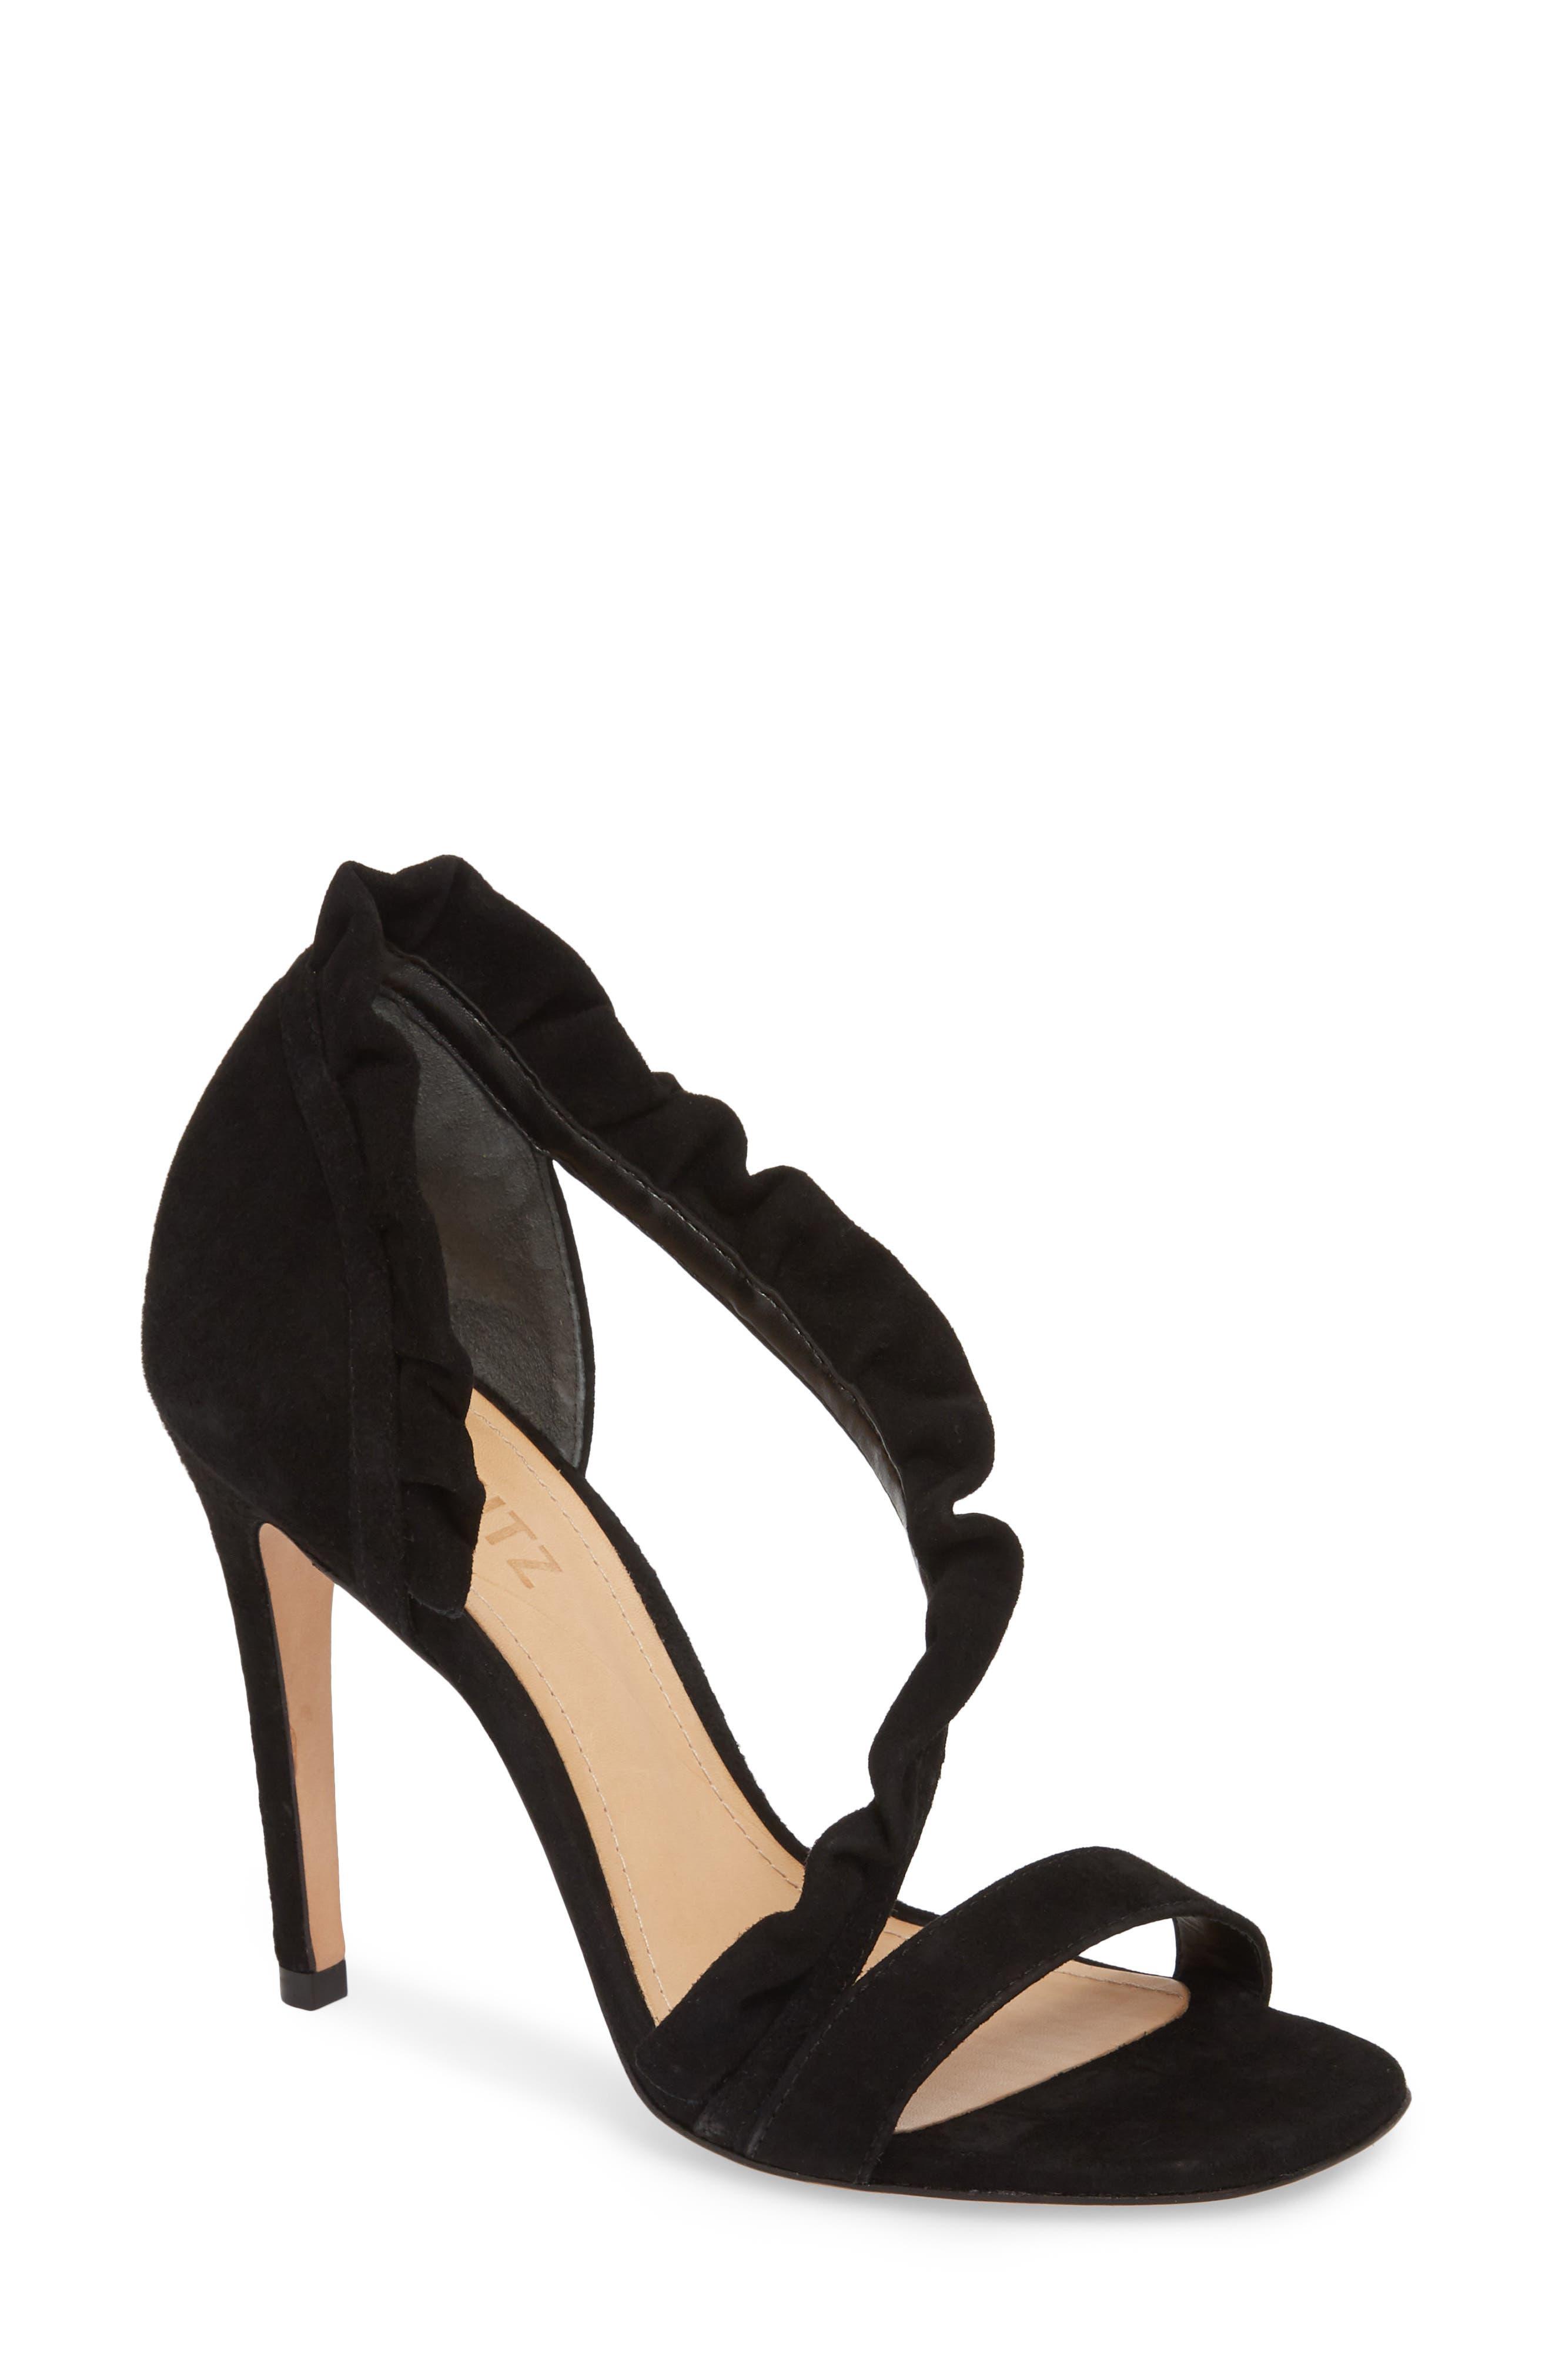 Schutz Aim Ruffle Sandal, Black